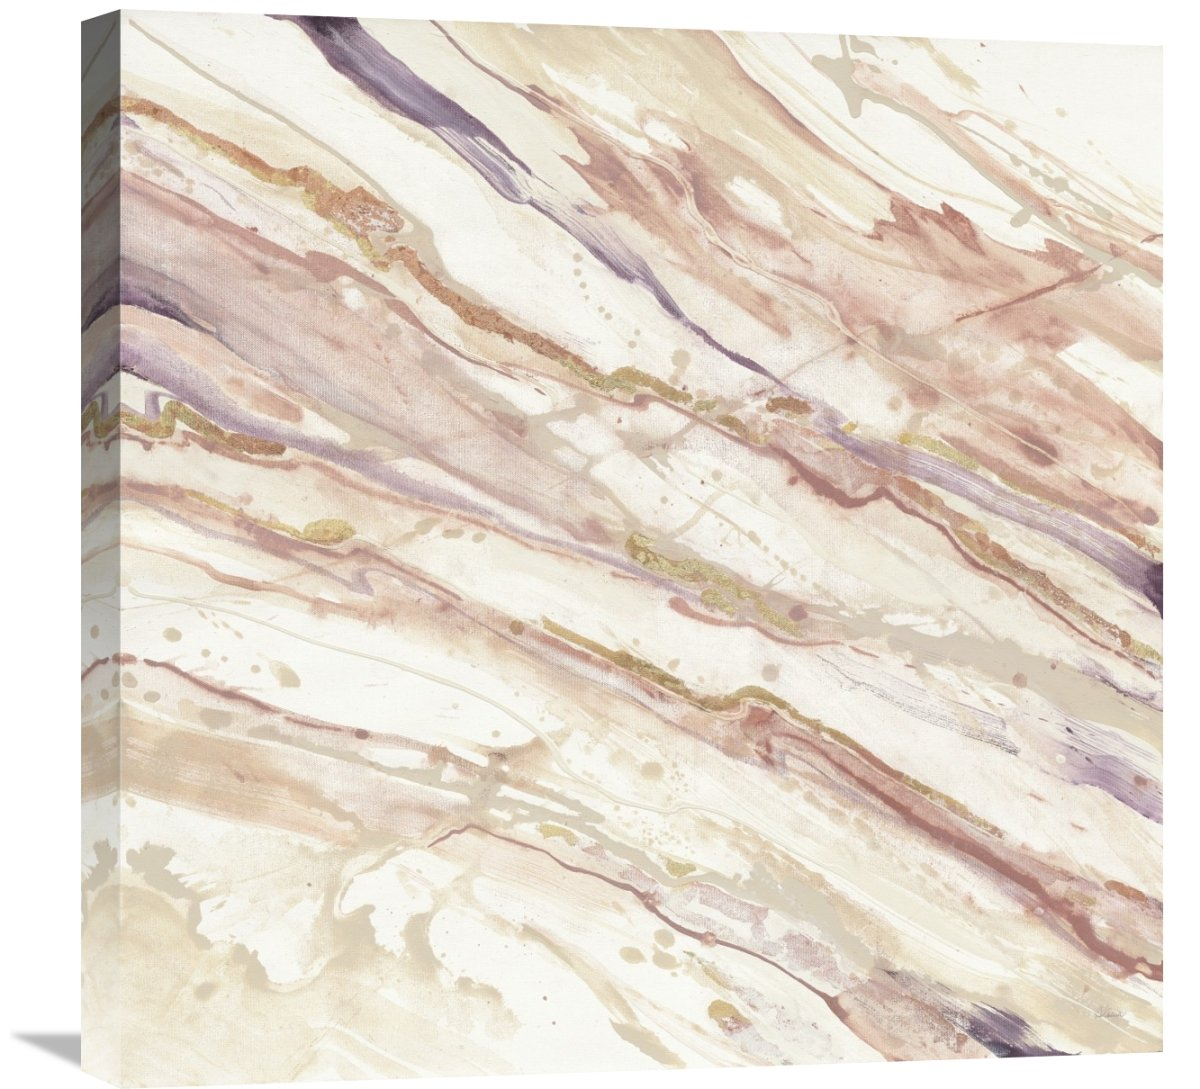 Global GalleryAlbena Hristova Copper Dreams Giclee Stretched Canvas Artwork 24 x 24